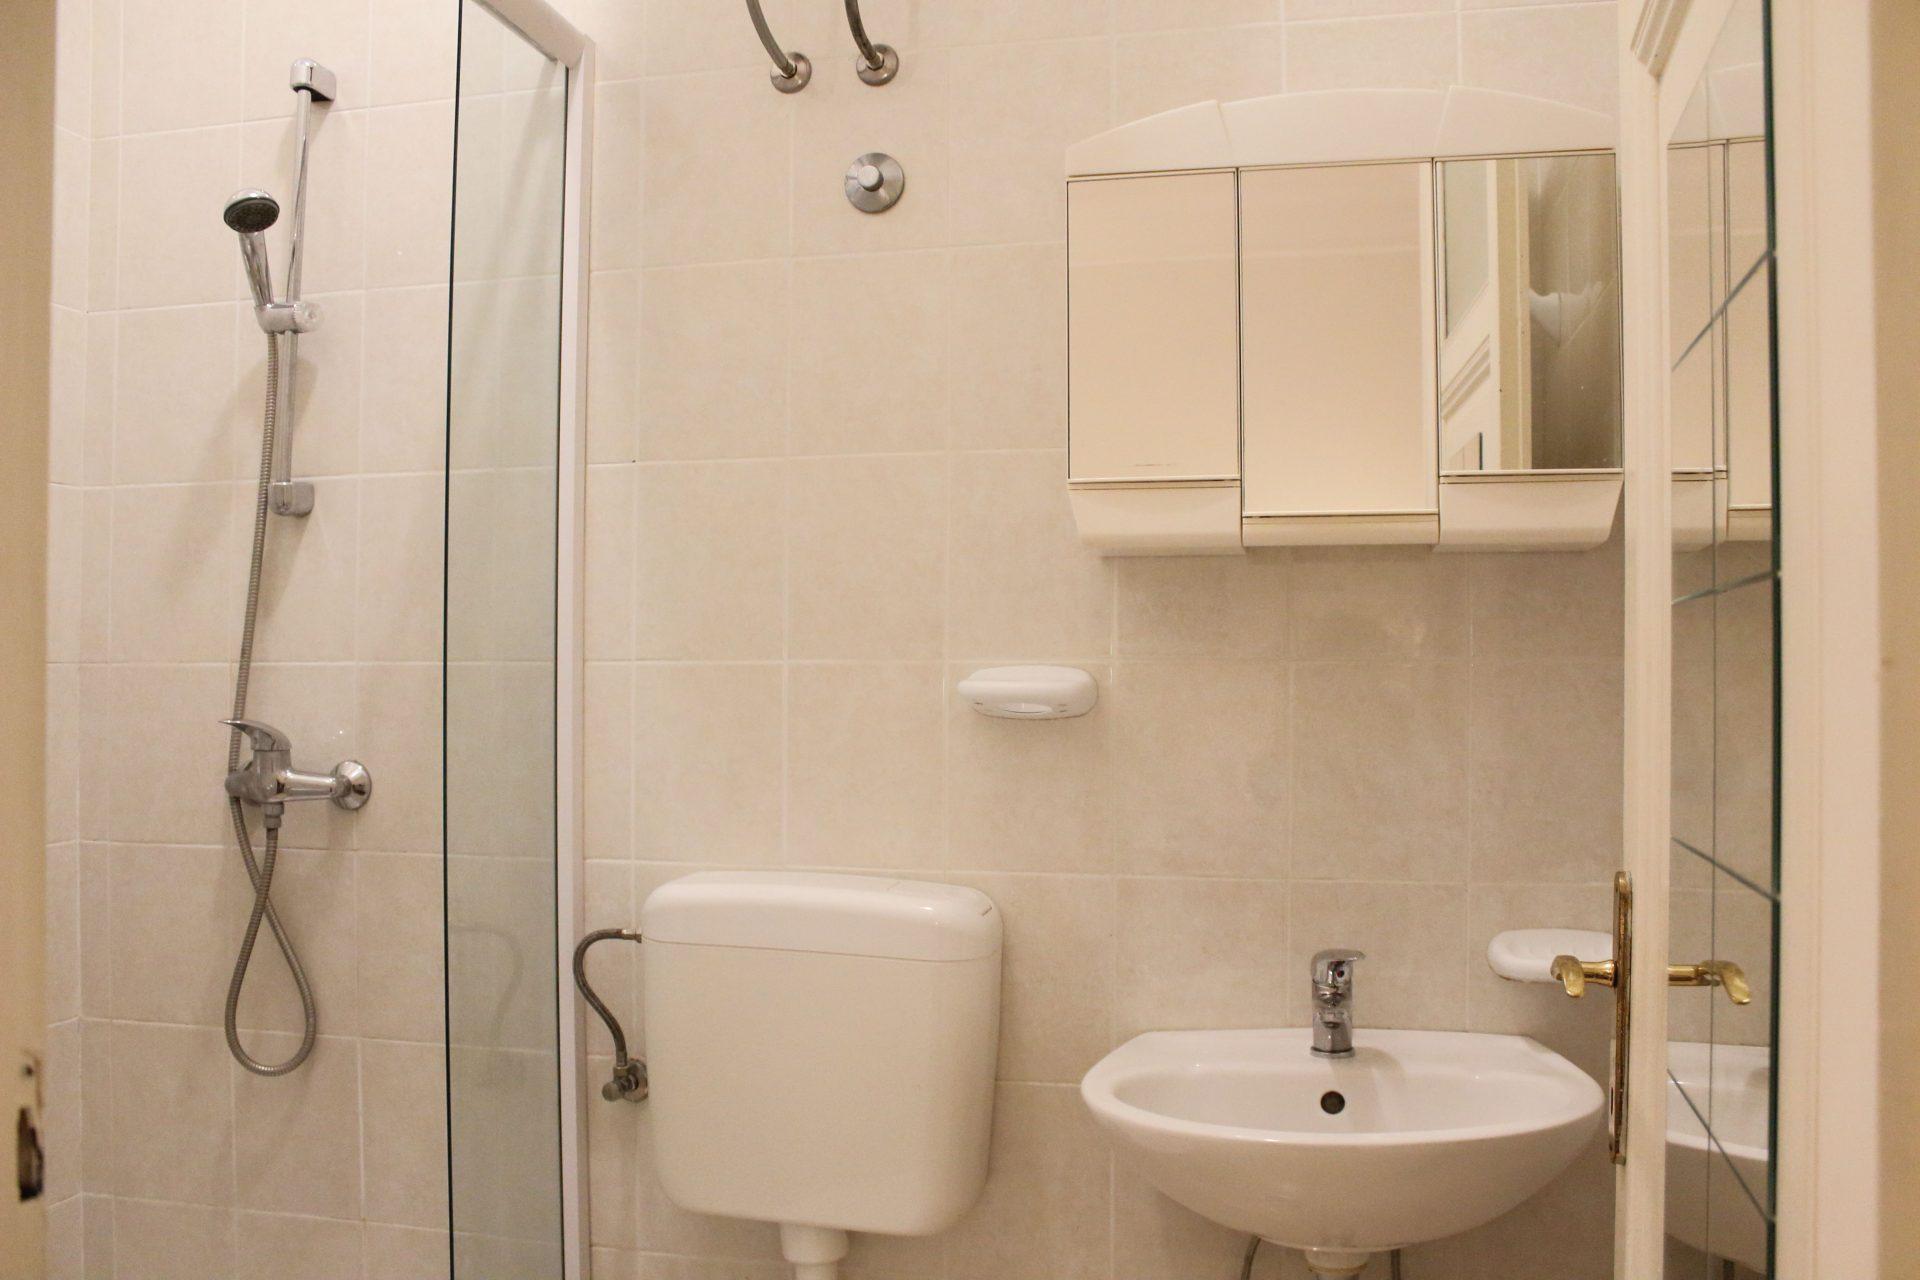 Villa San Giuseppe Lovran, center, quiet location, 50 m from sea, apartment 2+1 bathroom booking